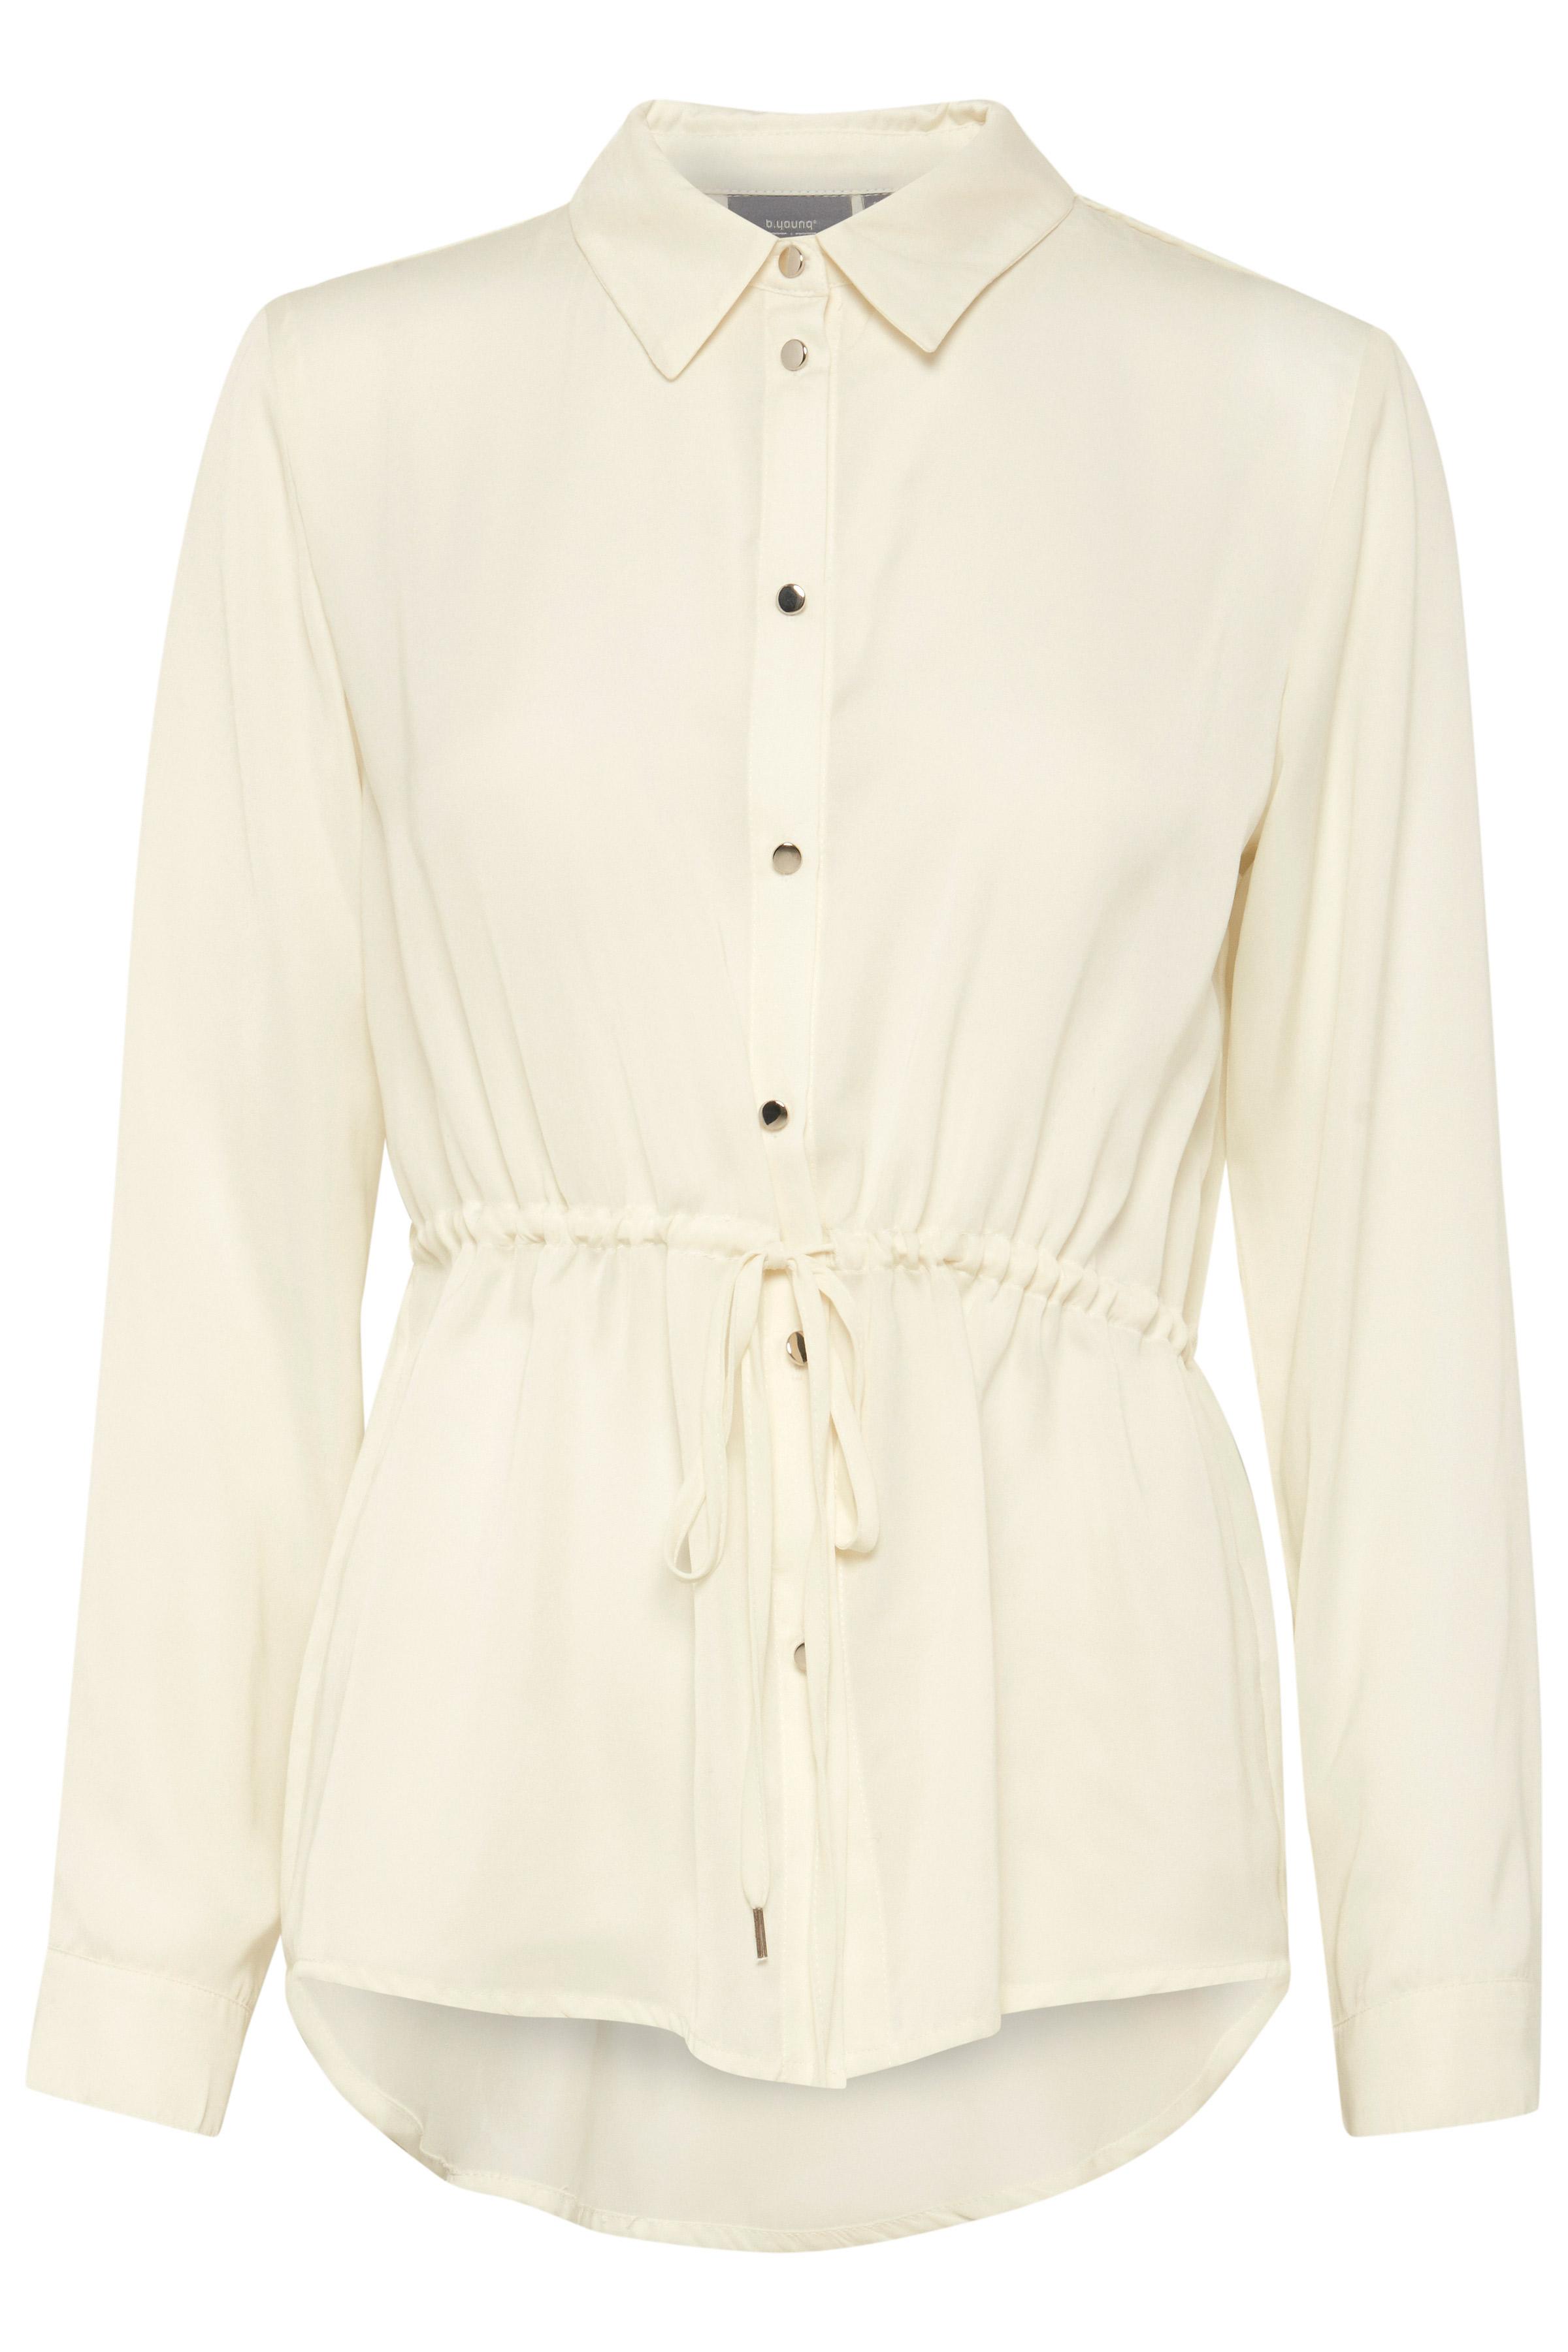 Off White Overhemd met lang mouwen van b.young – Koop Off White Overhemd met lang mouwen hier van size 36-46